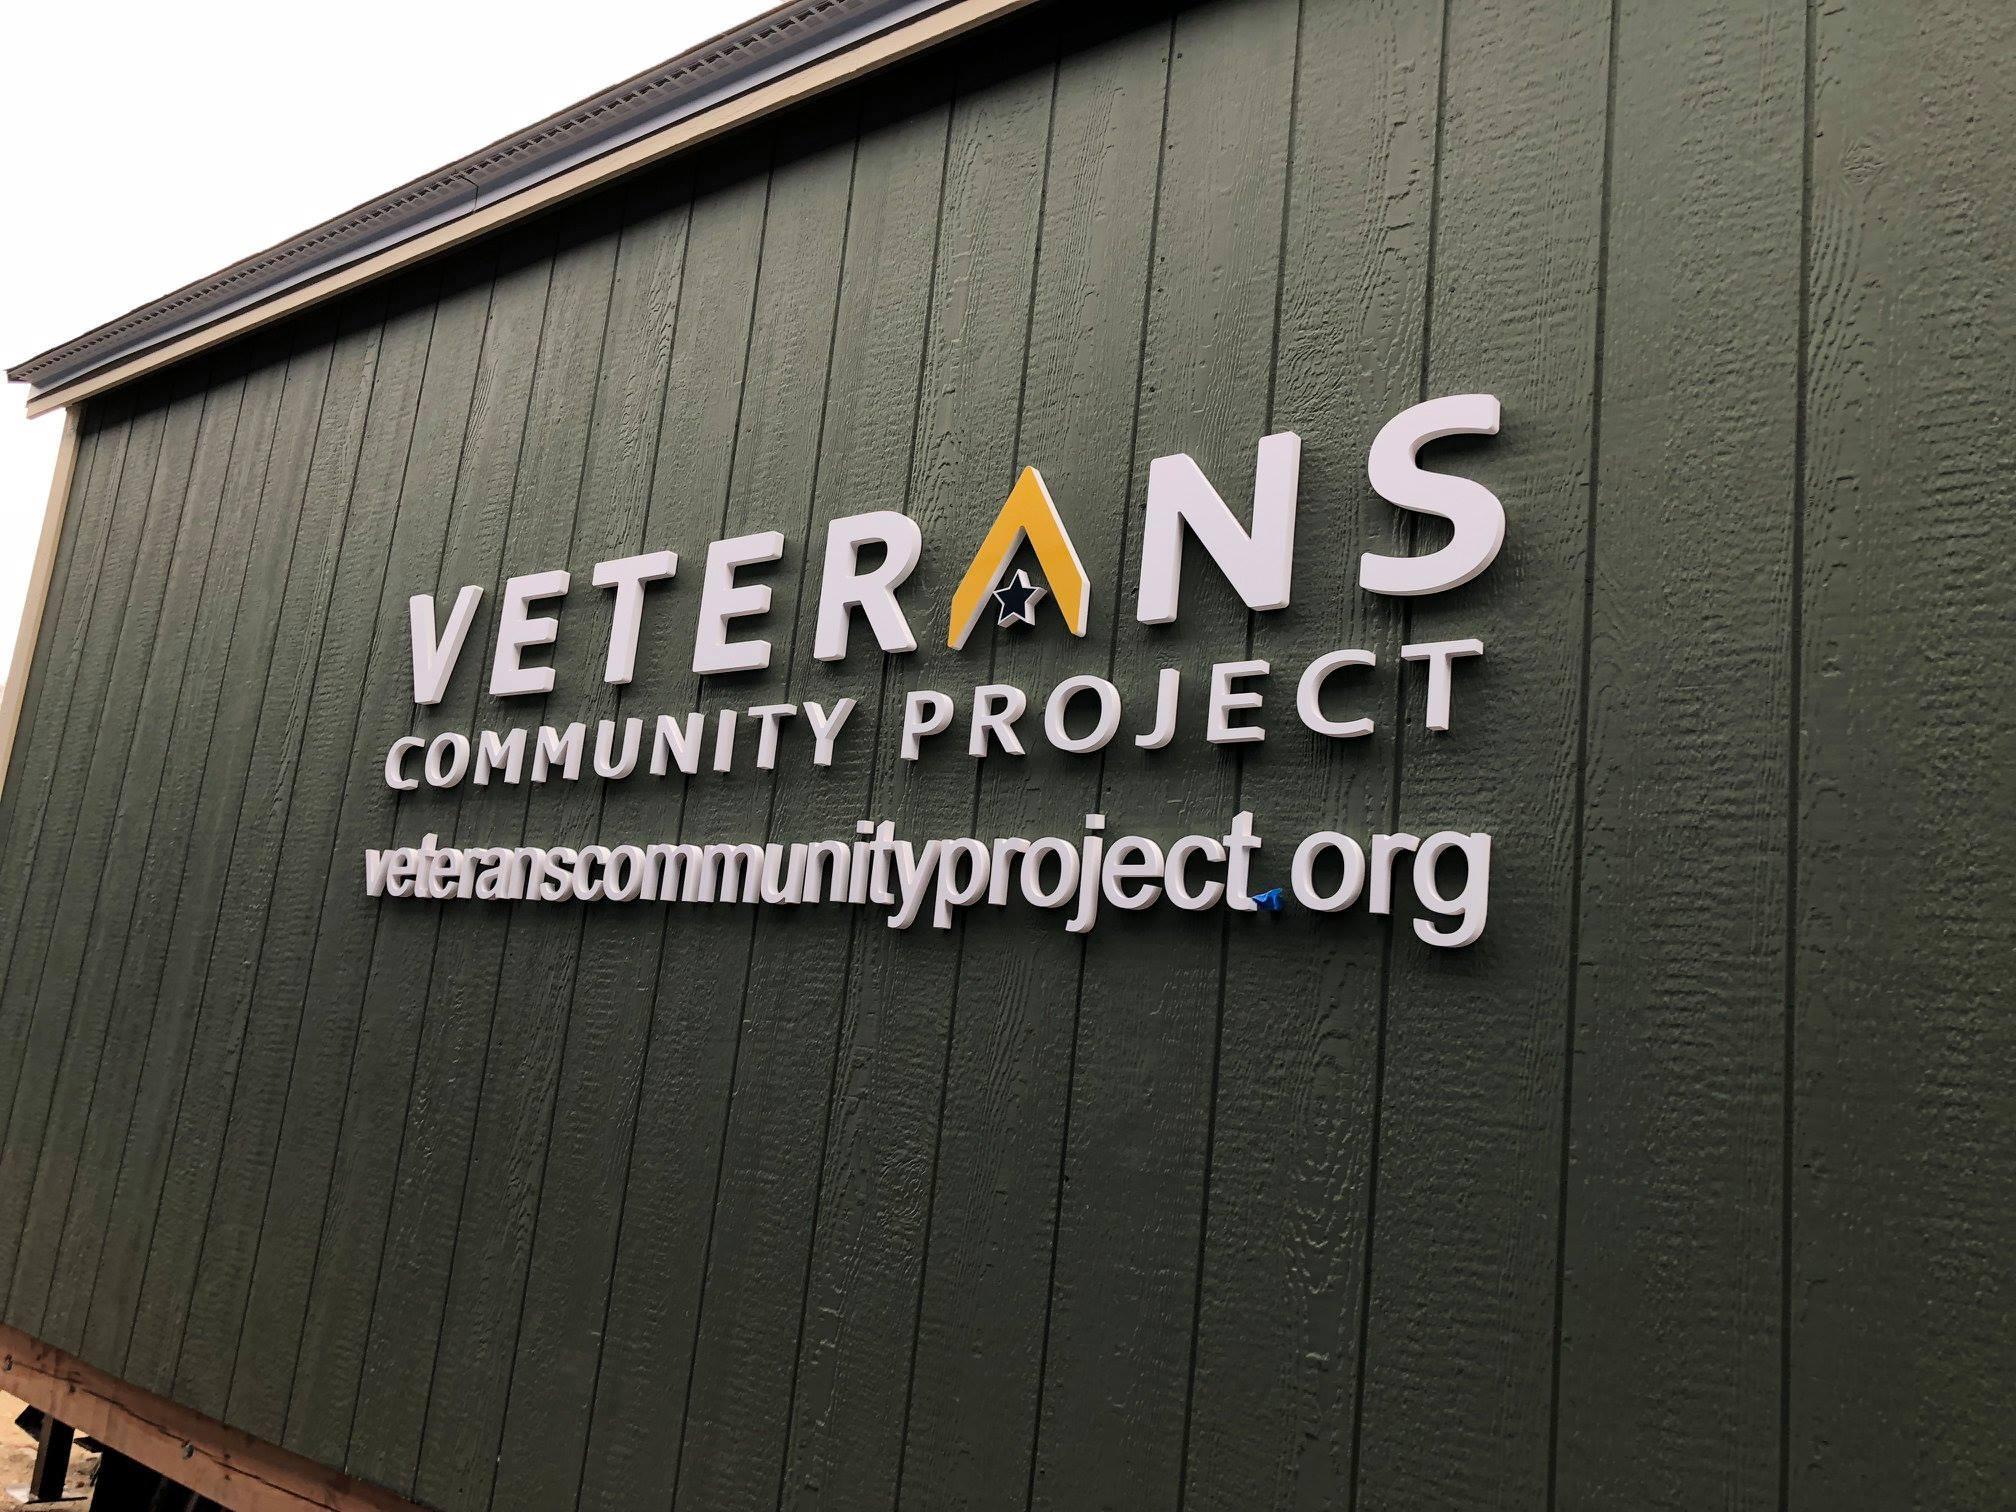 VeteransCommunityProject5-1522085117827.jpg